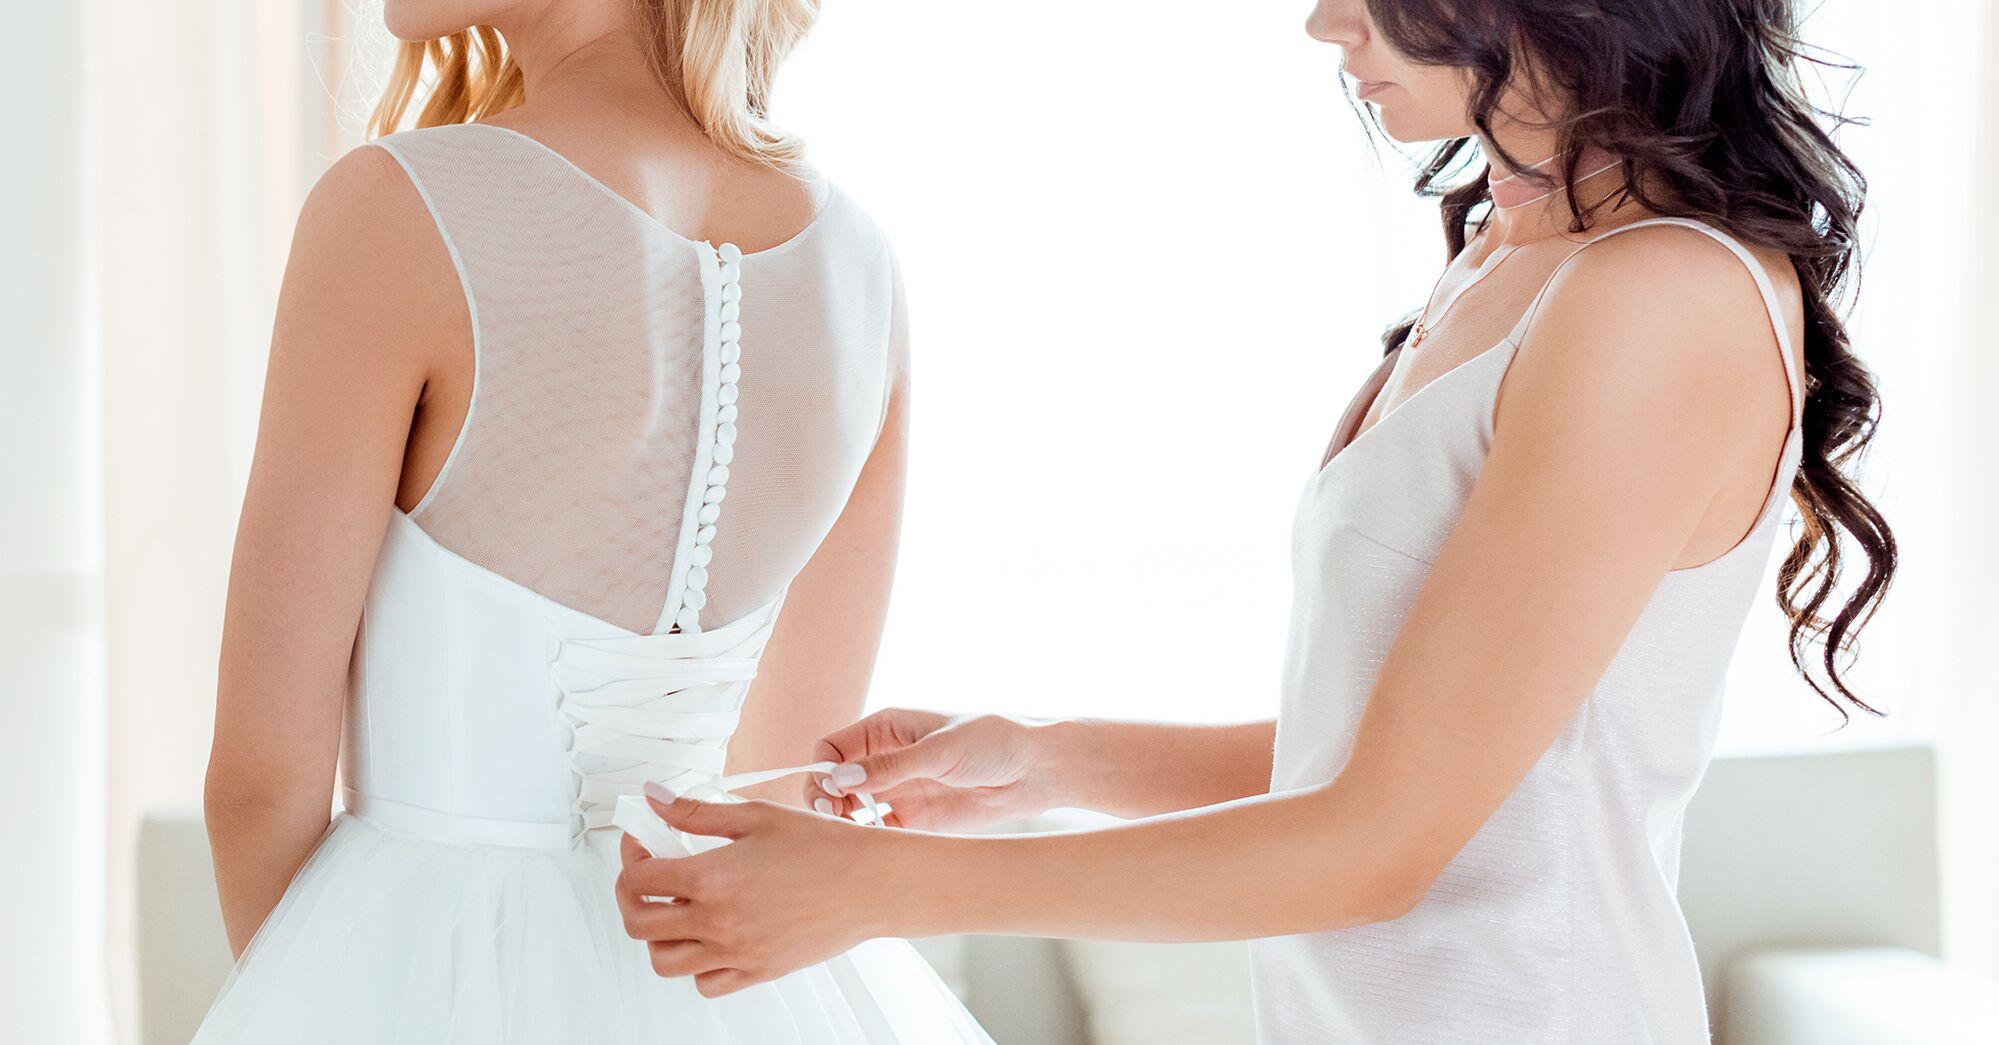 Bridal Shapewear And Undergarments Under The Wedding Dress Essentials,Mother Of Bride Wedding Dresses